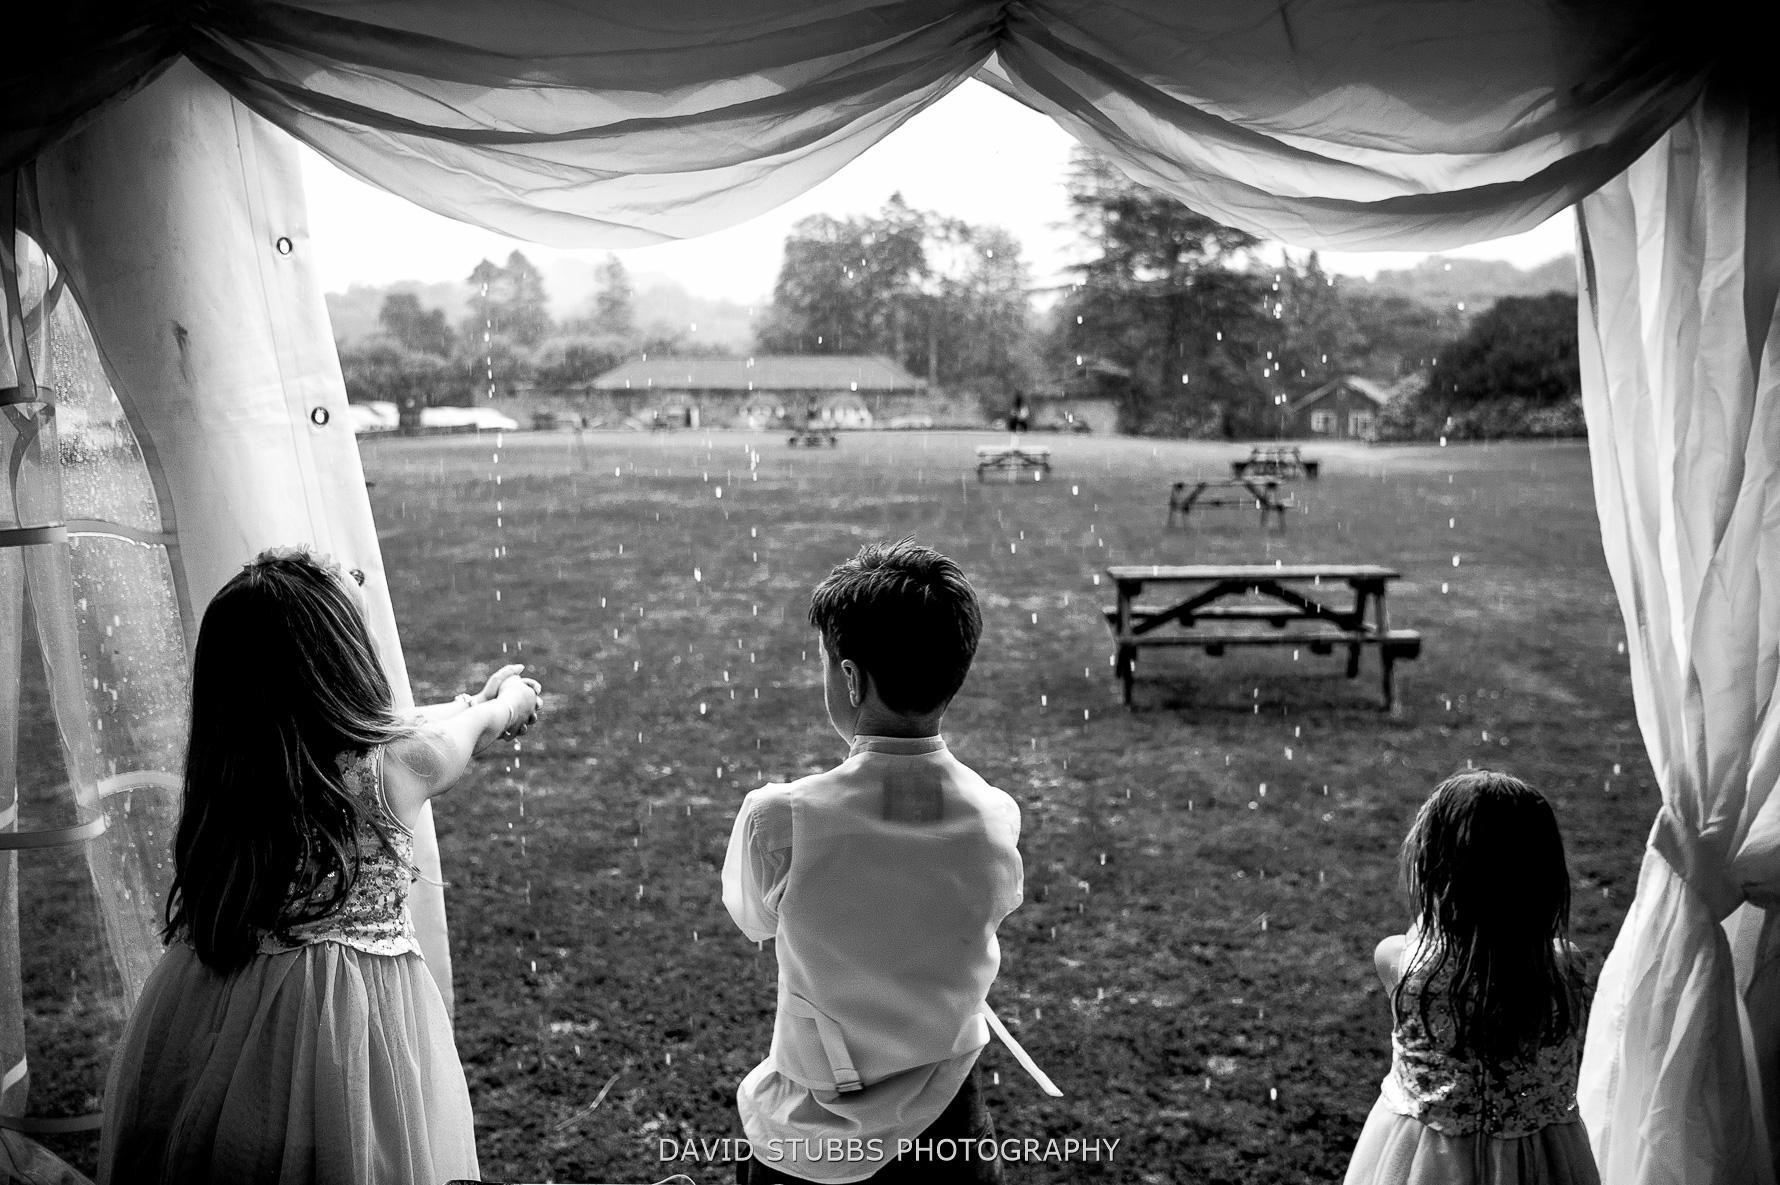 rain with kids